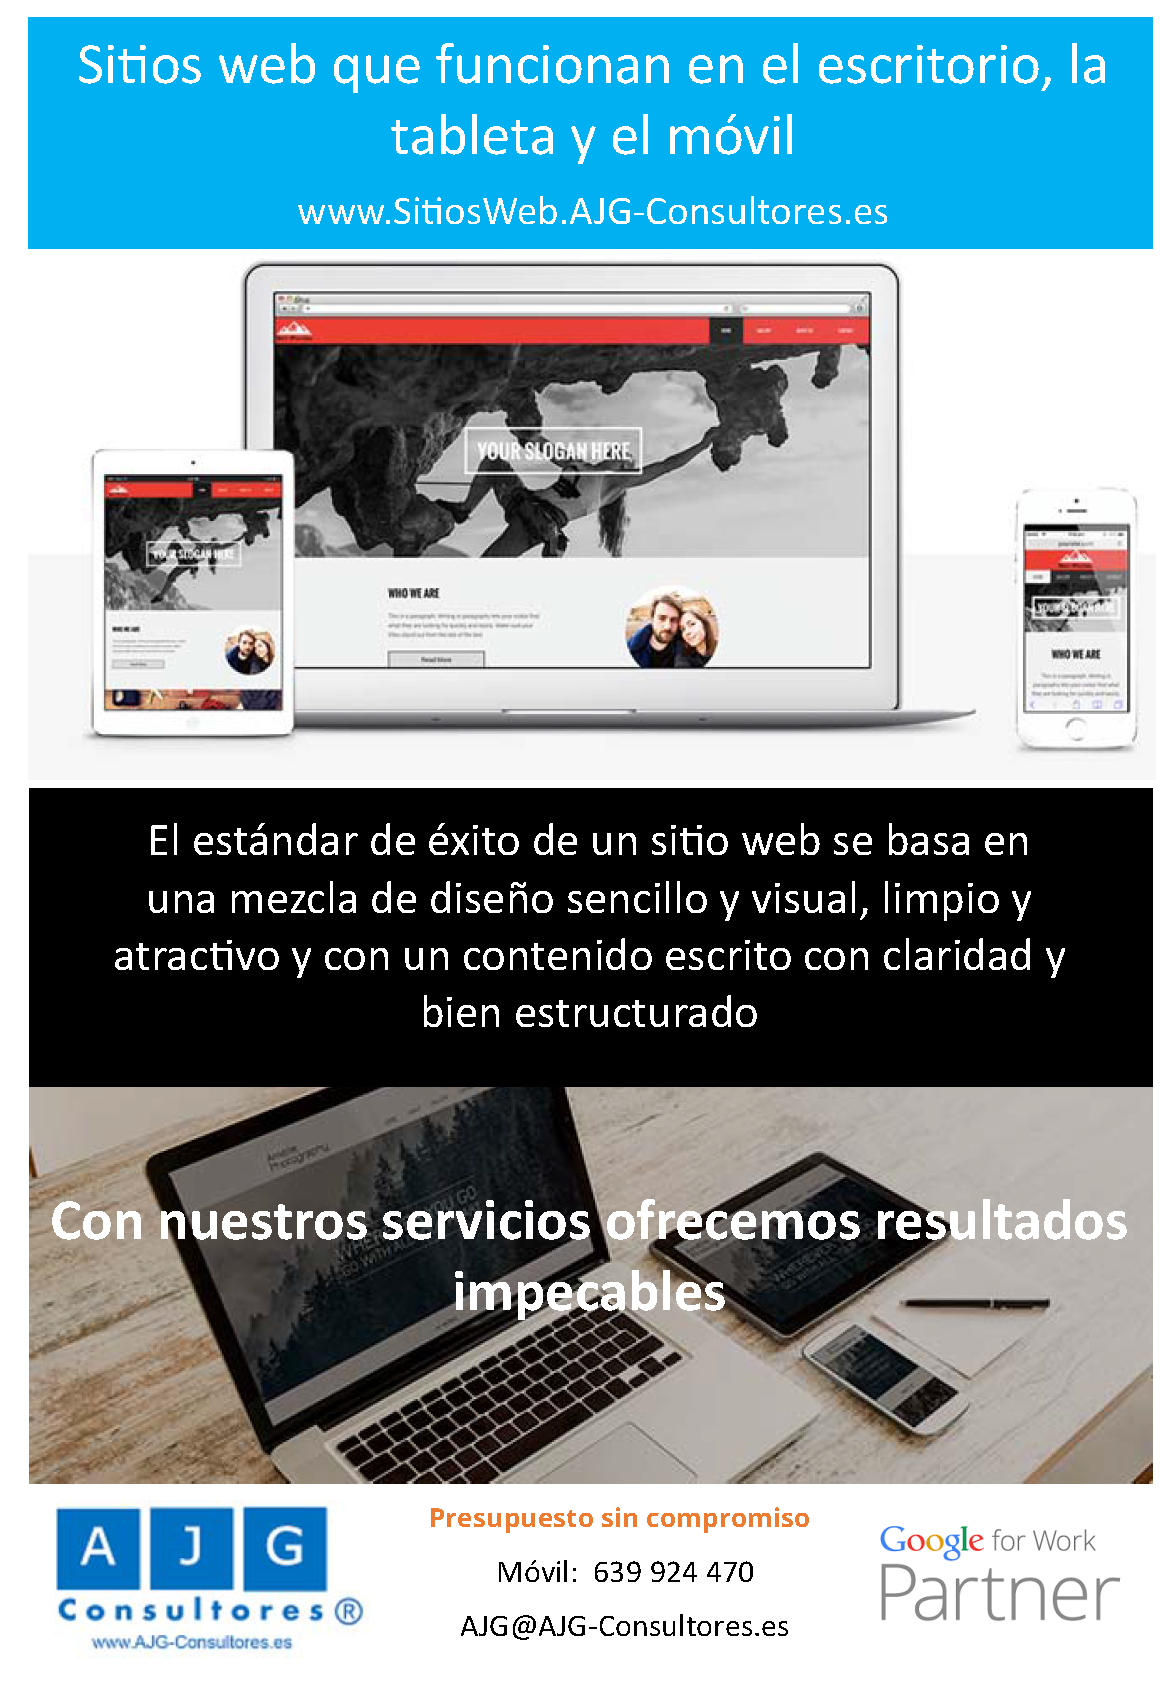 https://www.sitiosweb.ajg-consultores.es/